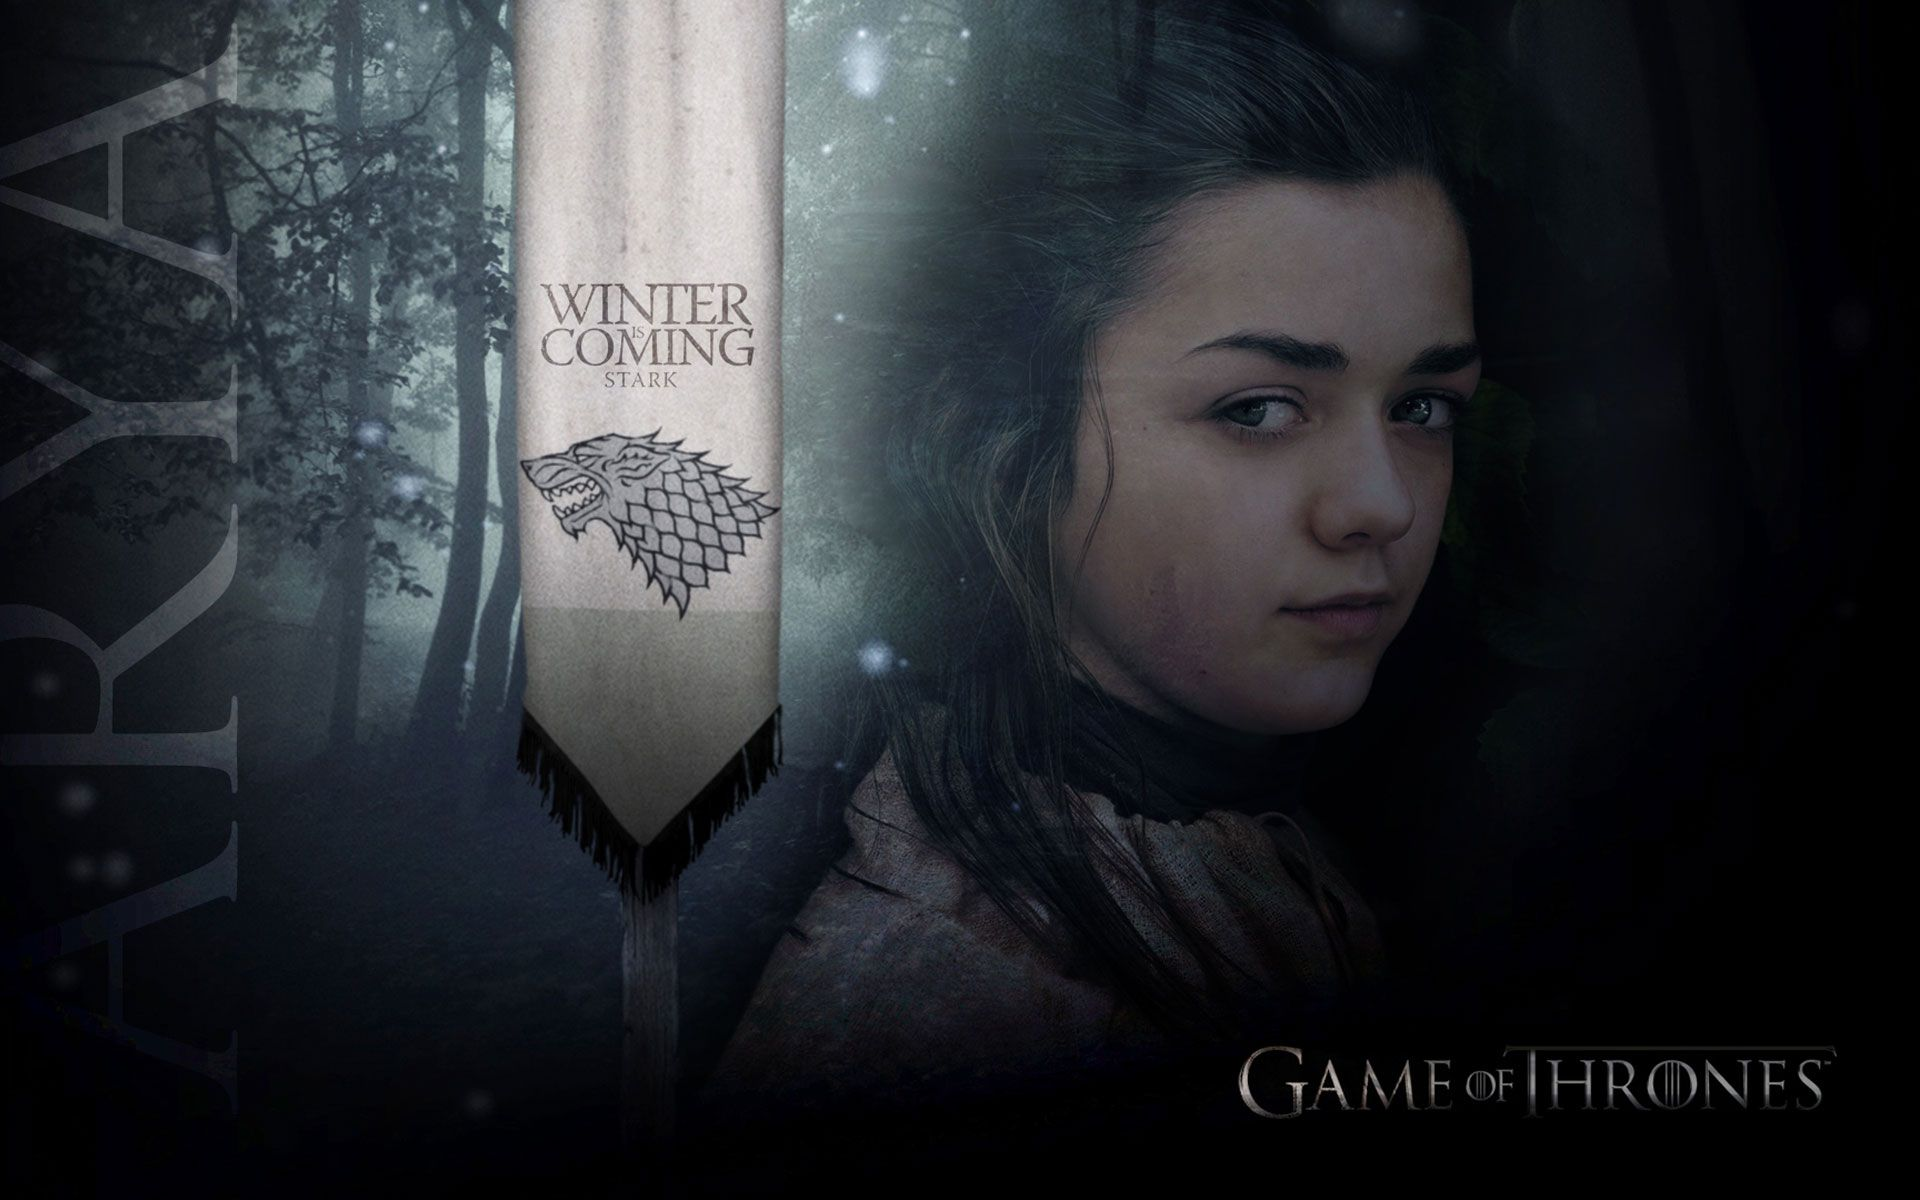 Game Of Thrones Wallpaper Arya Stark Game Of Thrones Arya Arya Stark Wallpaper Arya Stark